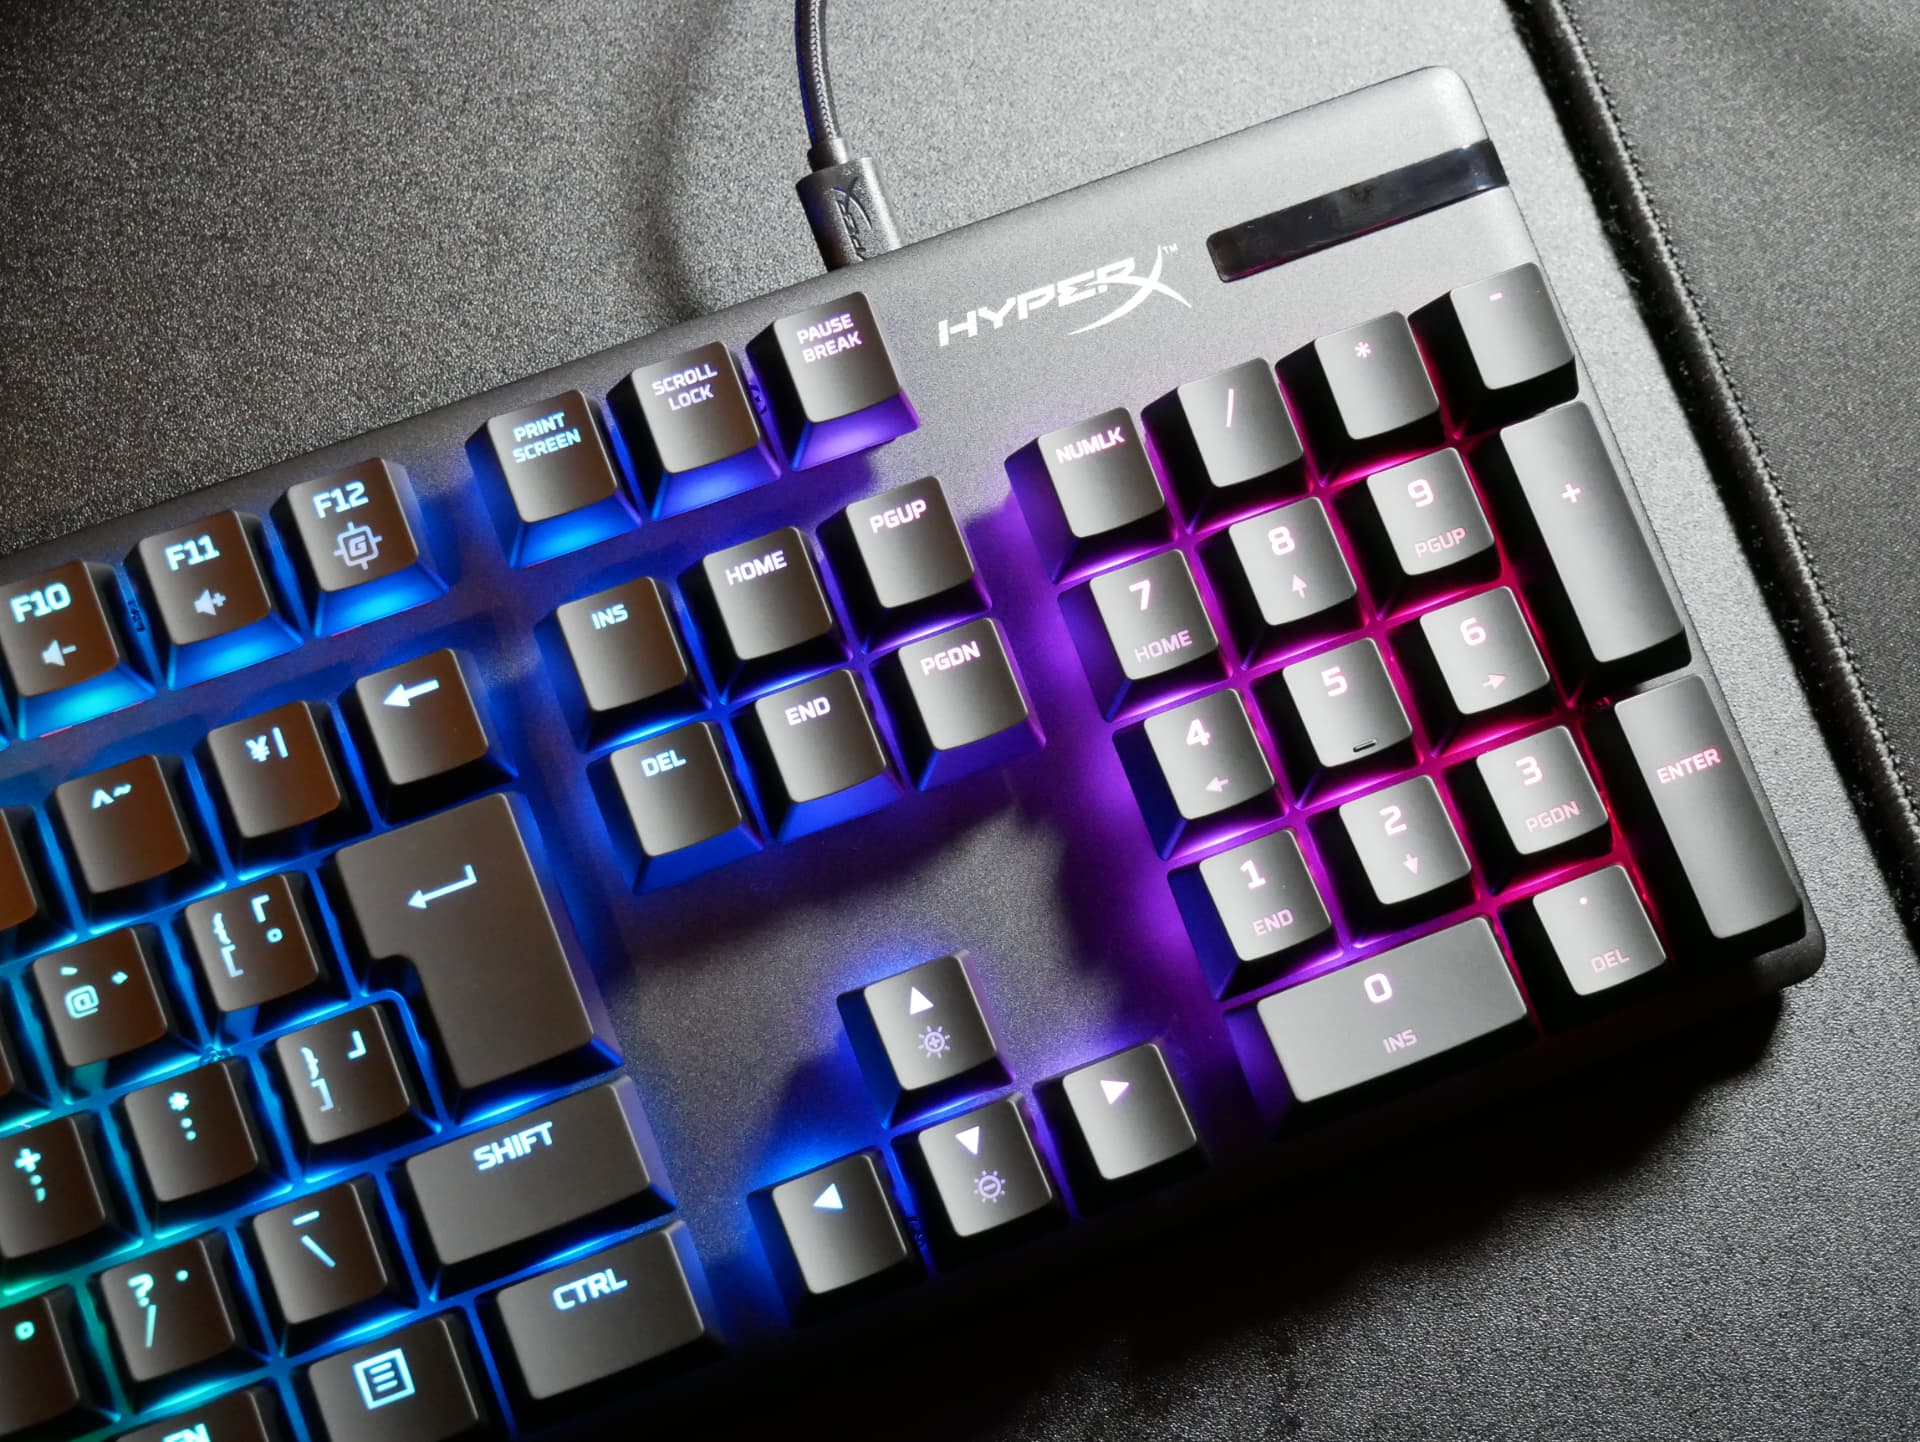 「HyperX Alloy Origins」レビュー。ブランド初の独自開発キースイッチを備えたゲーミングキーボード